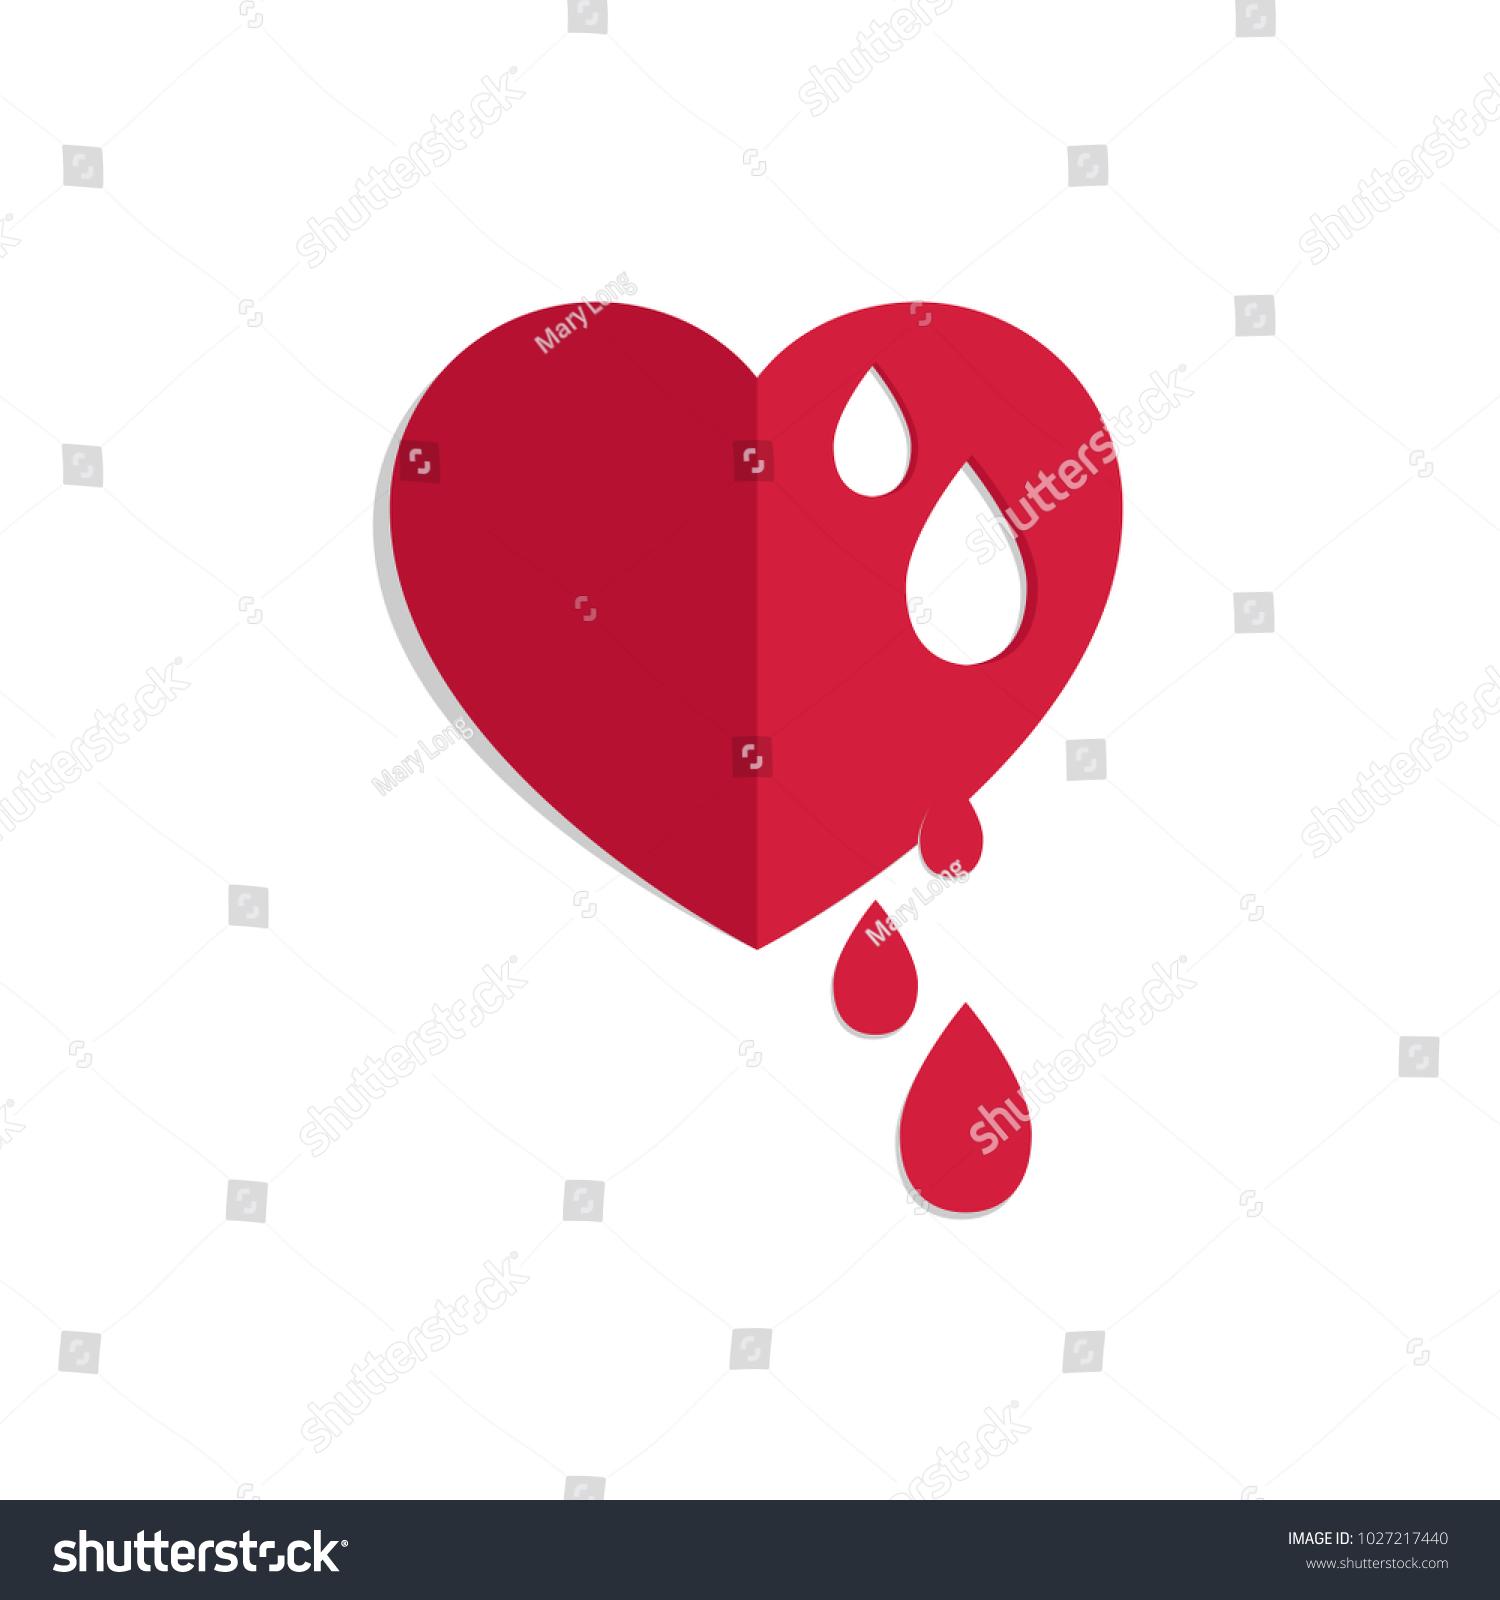 Vector red bleeding heart world hemophilia stock vector 1027217440 vector red bleeding heart for world hemophilia day world donor day medical concept buycottarizona